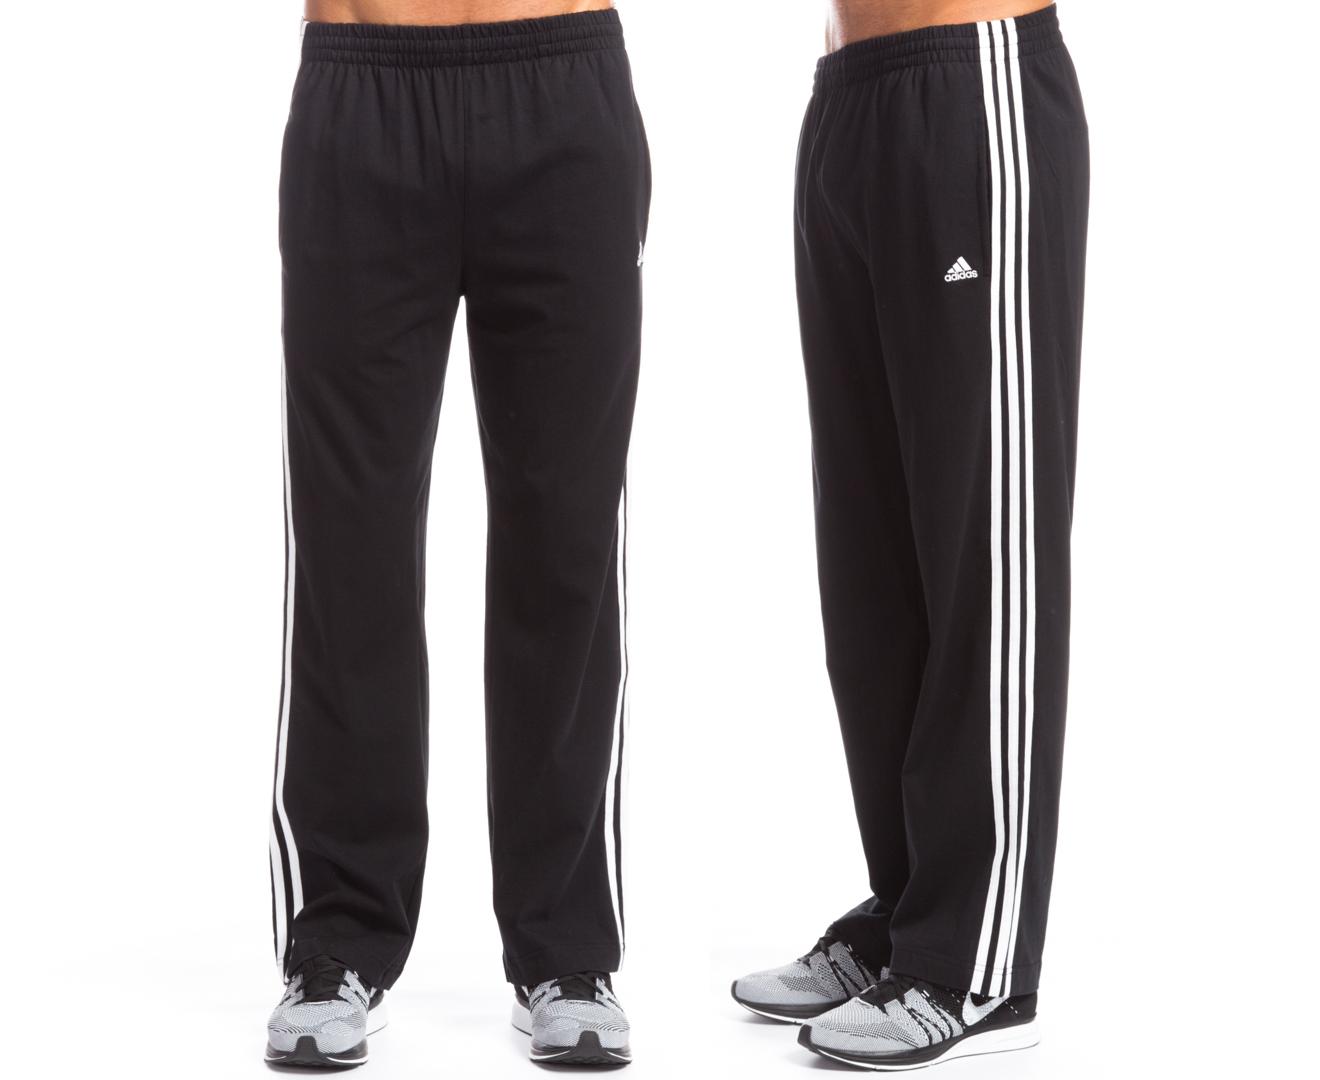 promo code 6b1fc 658b3 Adidas Mens 3 Stripe Jersey Pants - BlackWhite  Mumgo.com.au